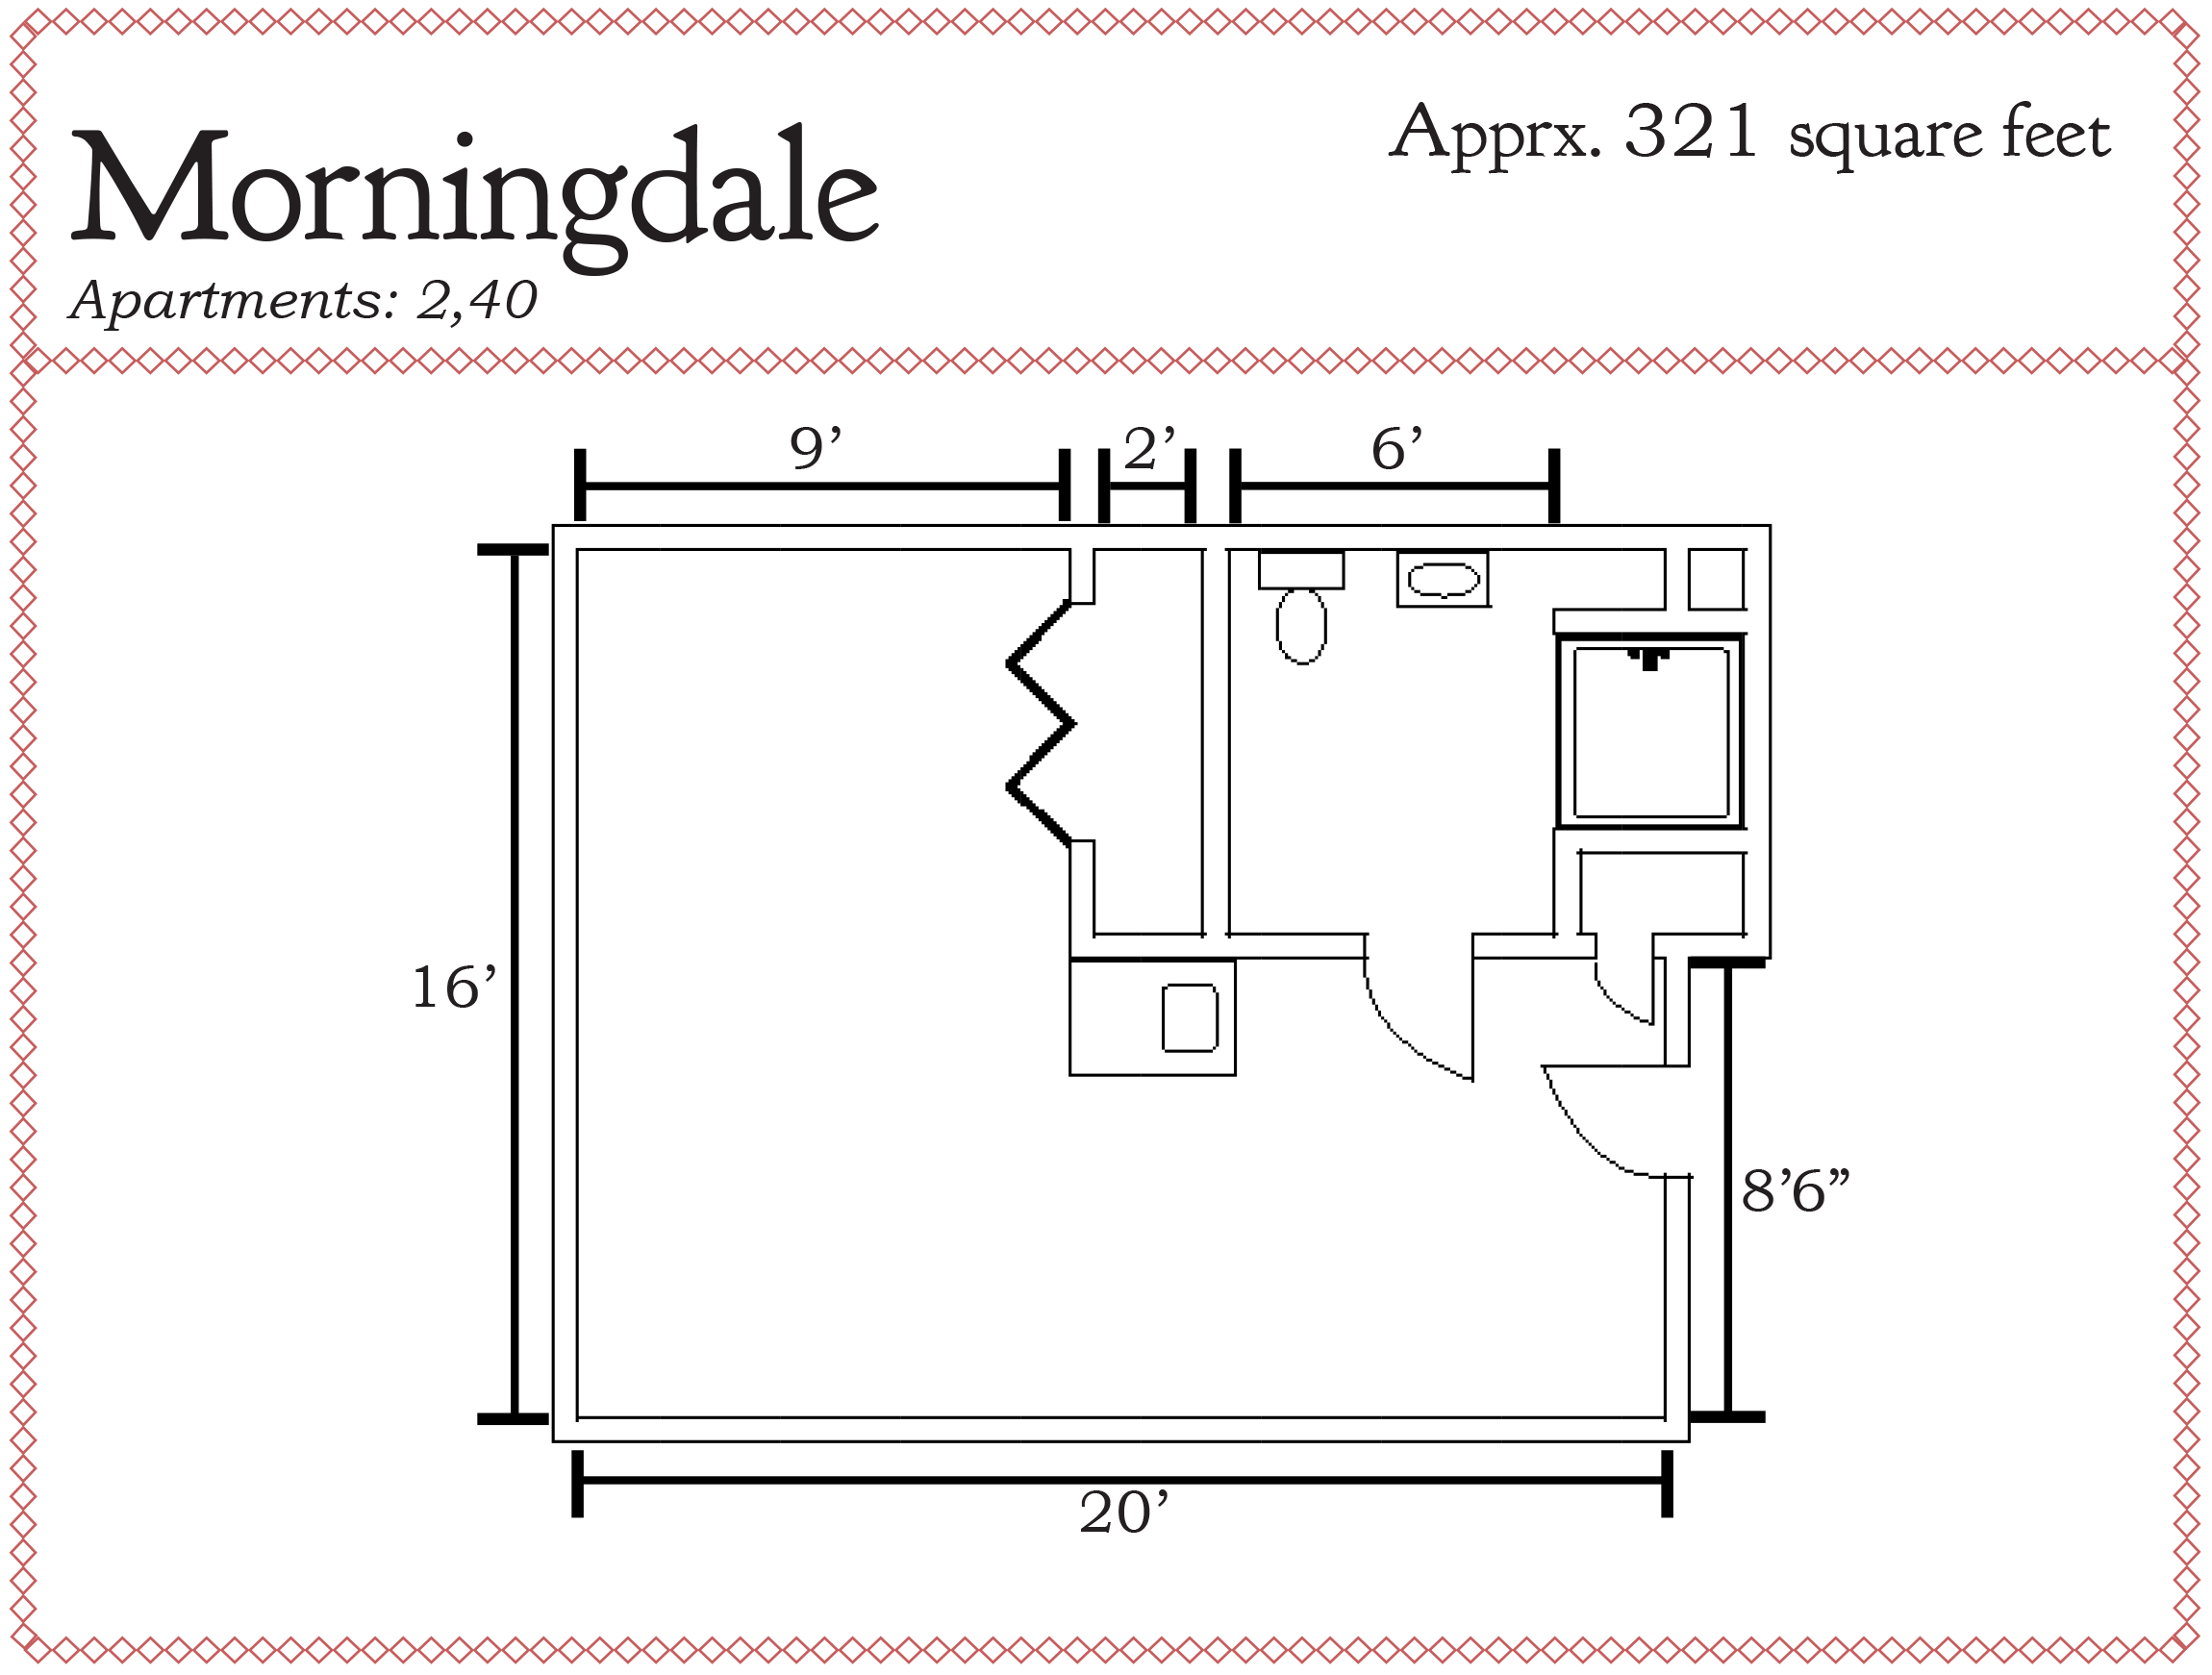 Morningdale